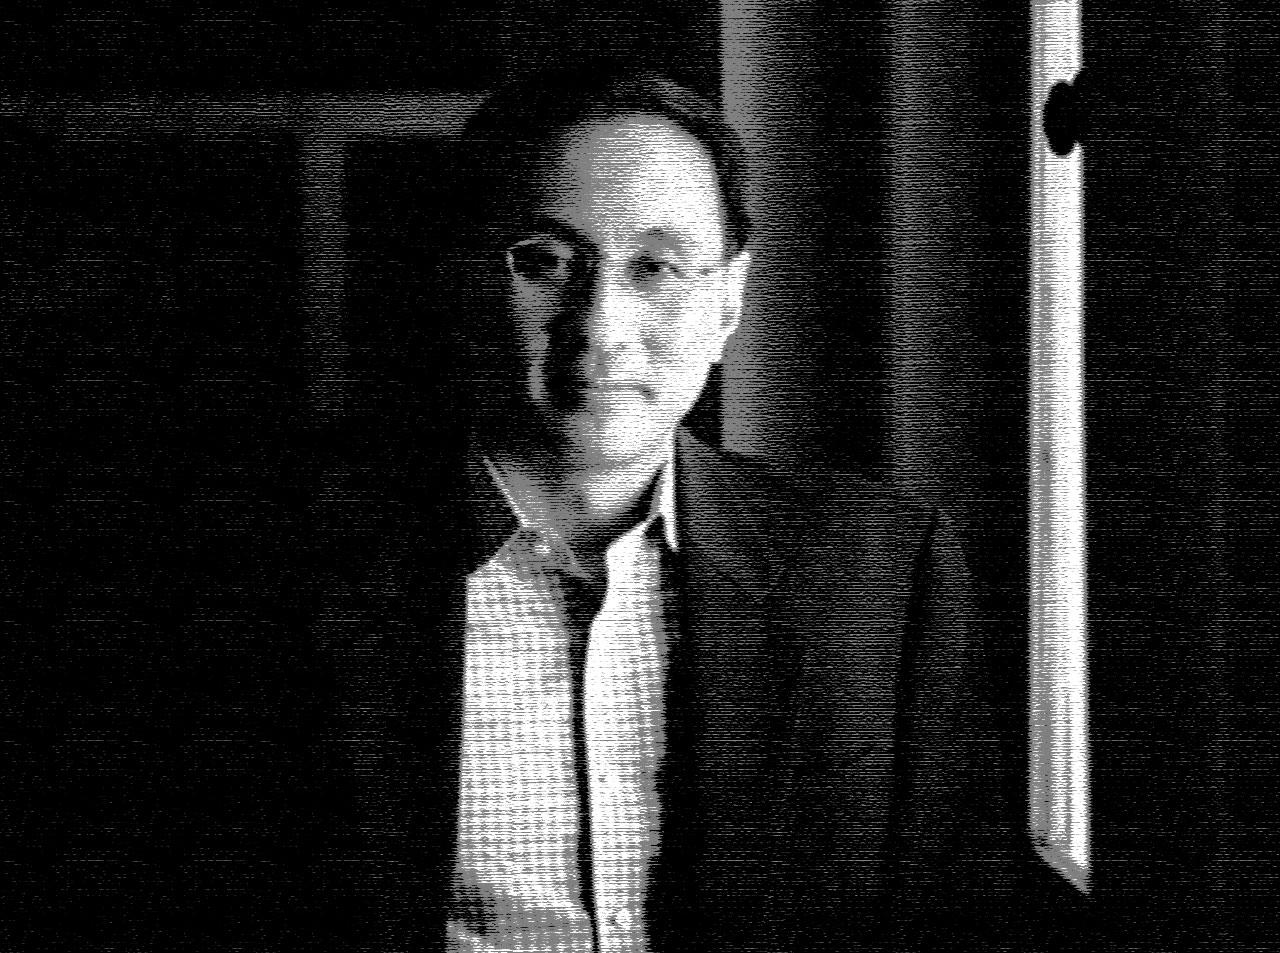 Does Desmond Kuek Even Exist? A Conspiracy Theory